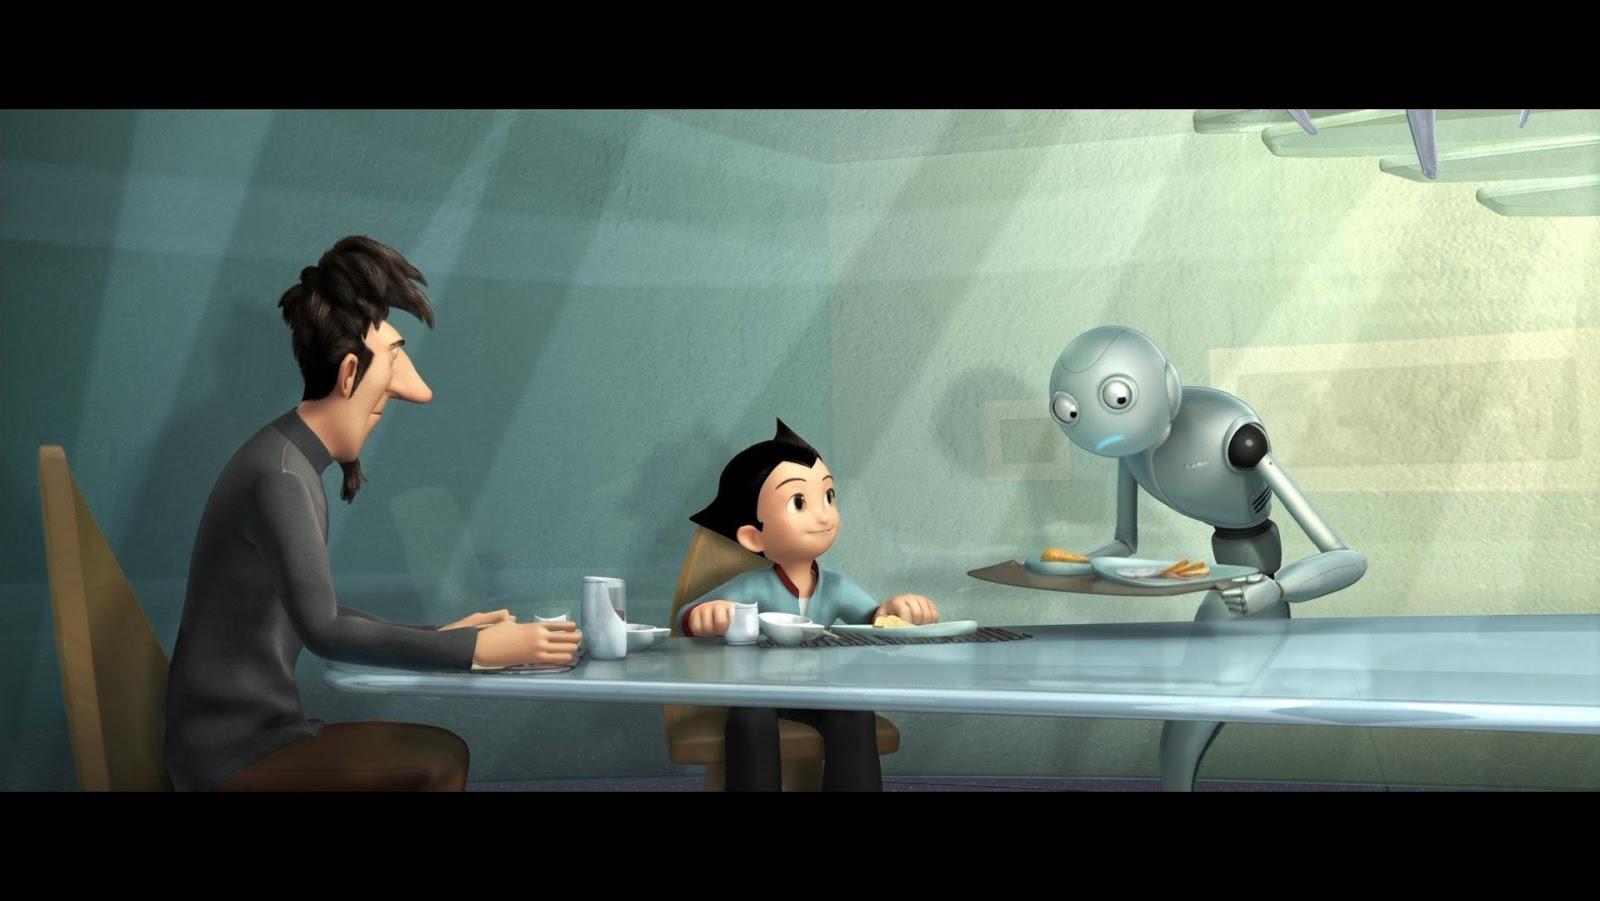 Astro Boy [2009] Full HD Movie in Hindi - Hinditoonz